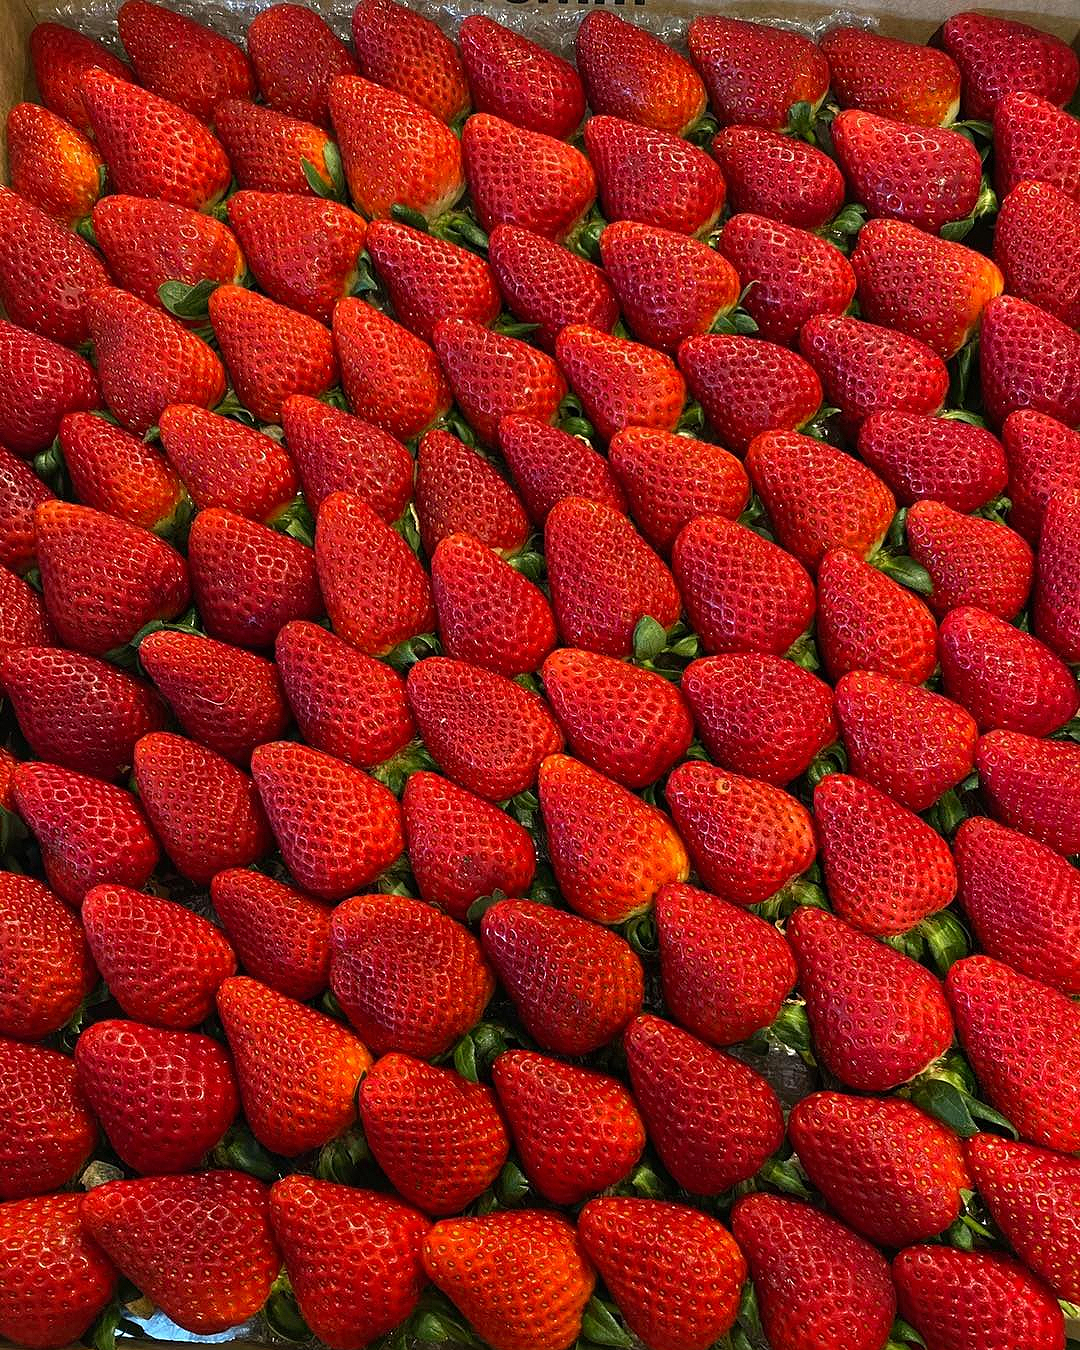 Strawberries upon strawberries at Bell's Berries